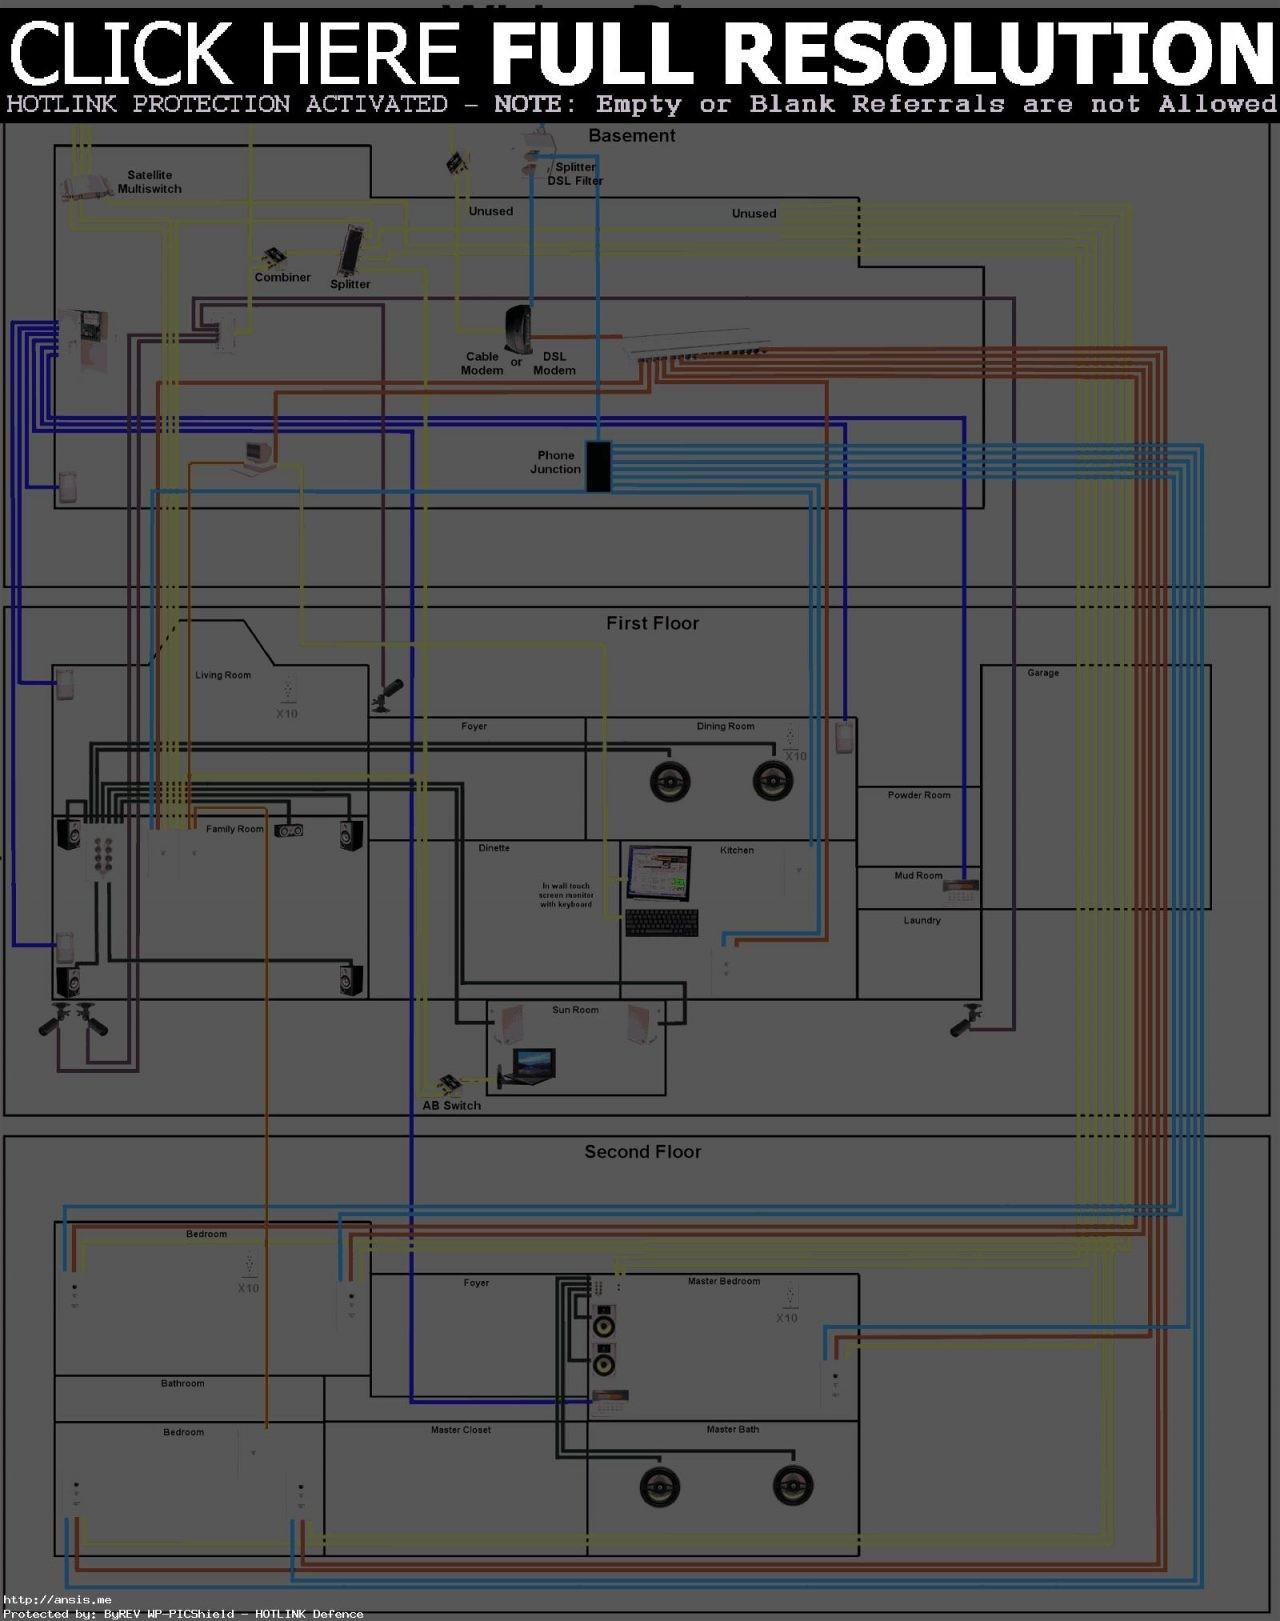 Adsl Home Wiring Diagram New Adsl Wiring Diagram Australia Refrence Dsl Phone Jack Wiring Diagram